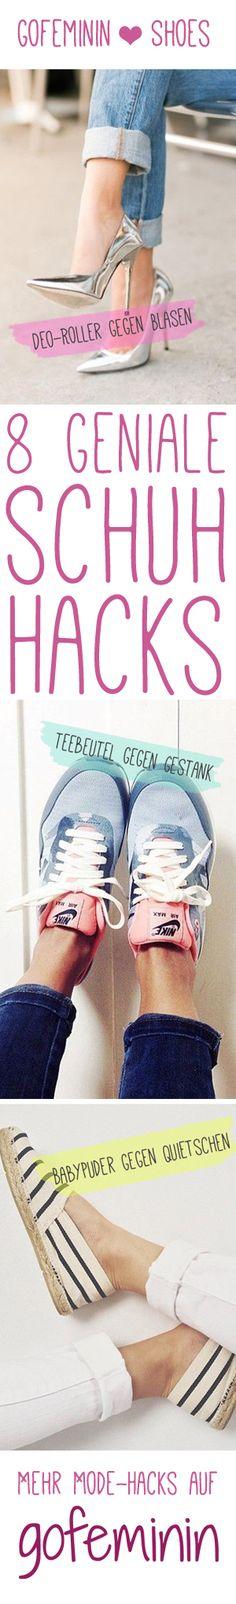 8 GENIALE Schuh Hacks: http://www.gofeminin.de/styling-tipps/schuh-hacks-s1428625.html #shoes #hacks #lifehacks #shoehacks